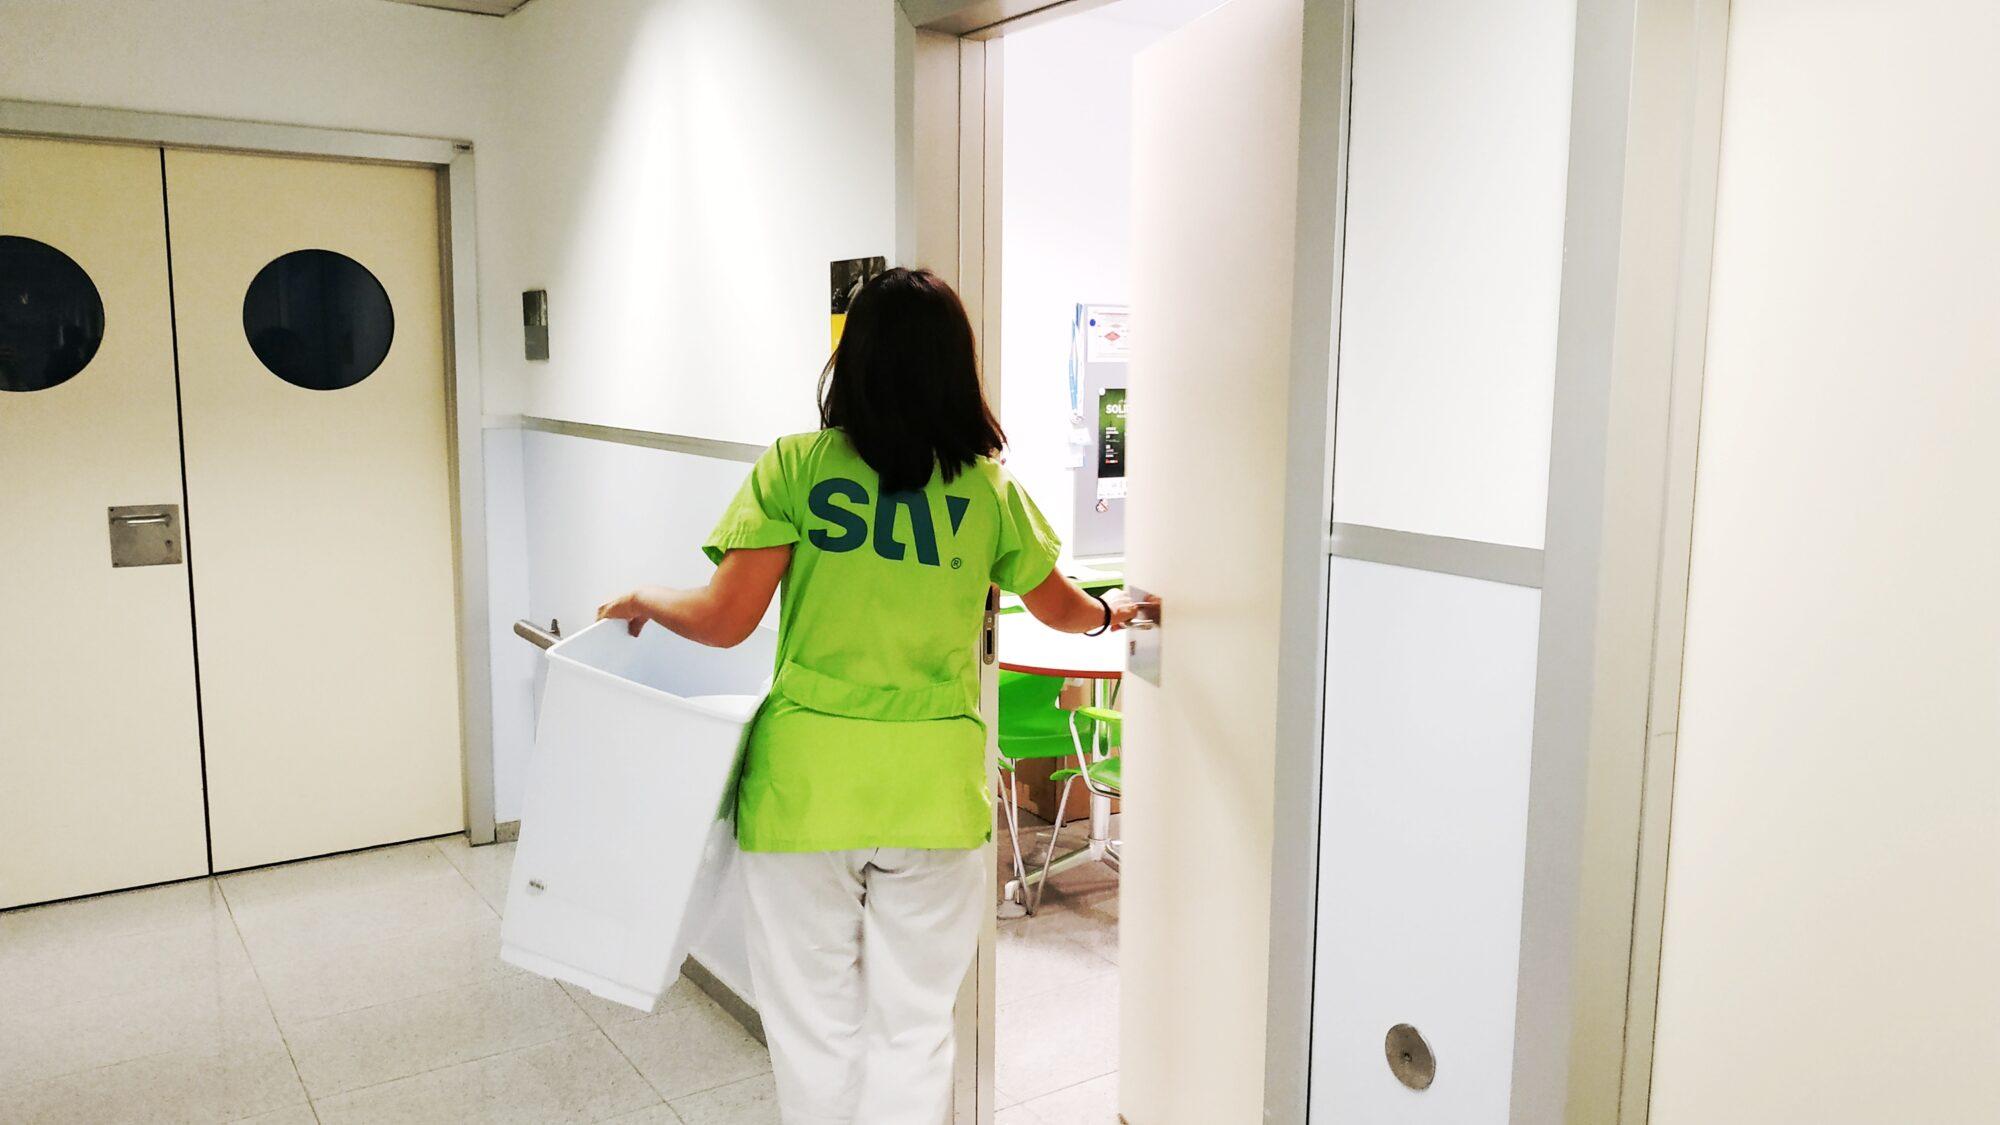 Gripe limpieza hospital